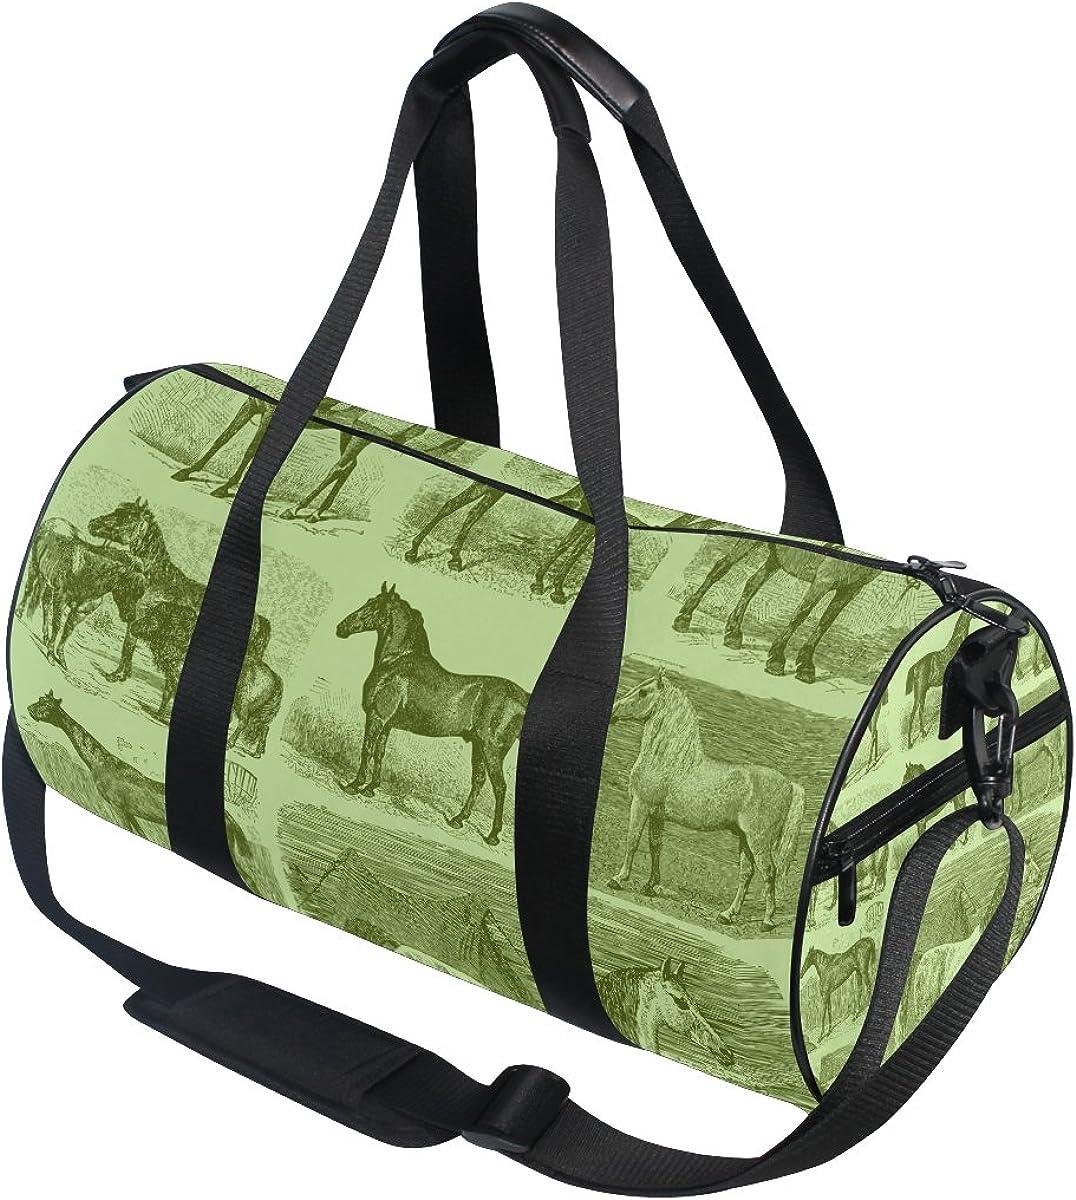 Evolutions Horses Travel Duffel Bag Sports Gym Bag For Men /& Women